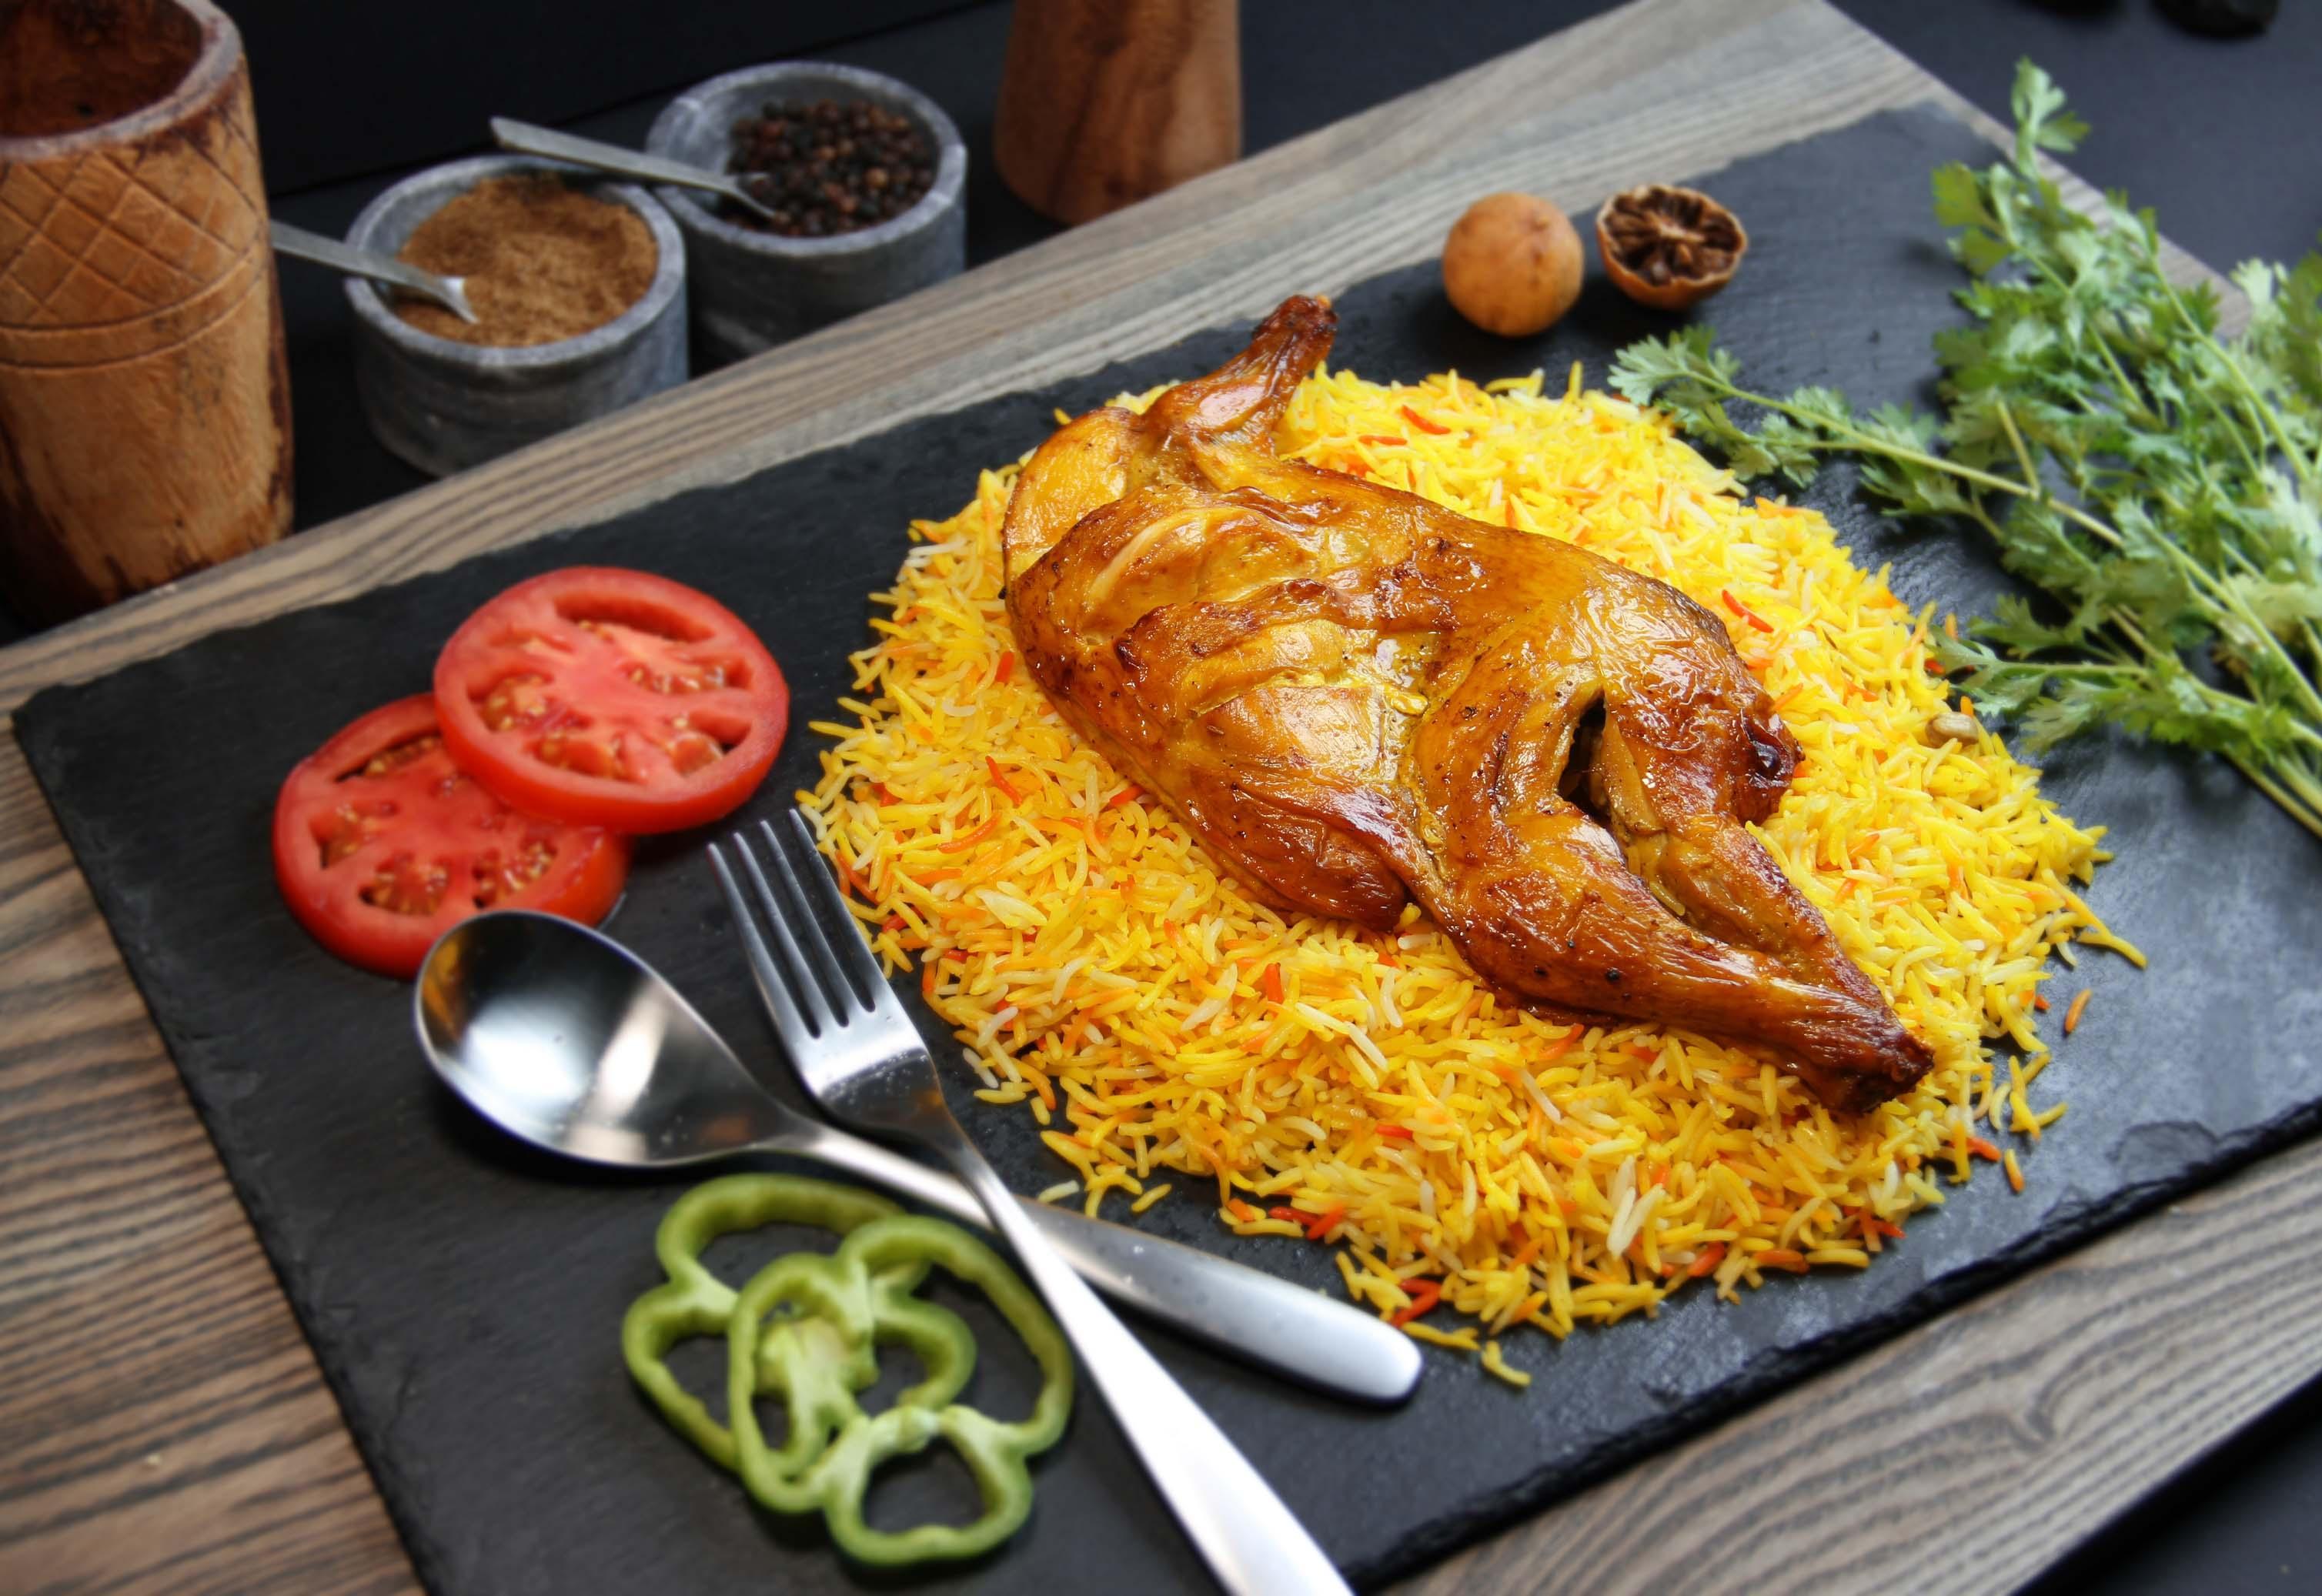 UAE-based restaurant Mandilicious debuts in Qatar